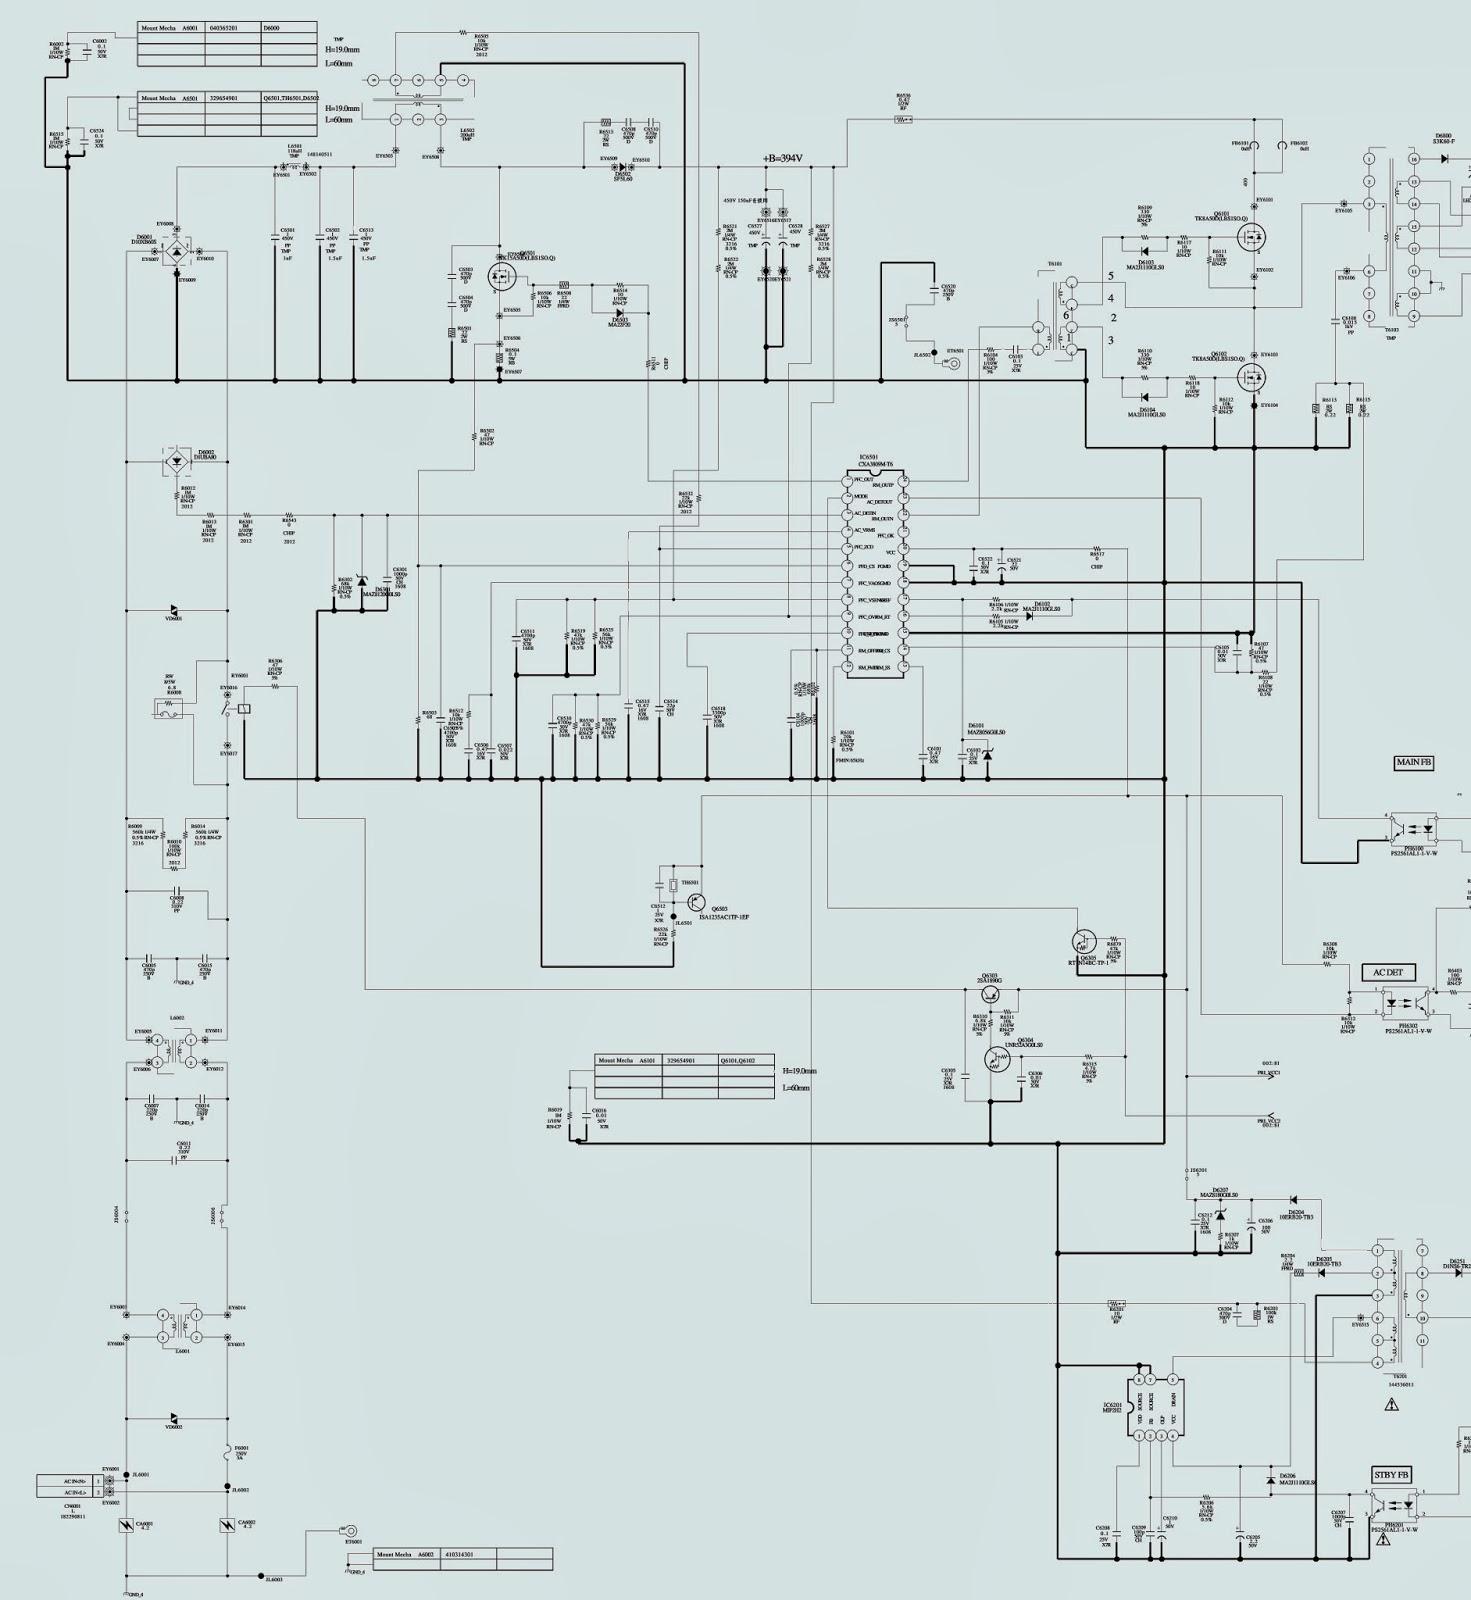 playstation 2 wiring diagram